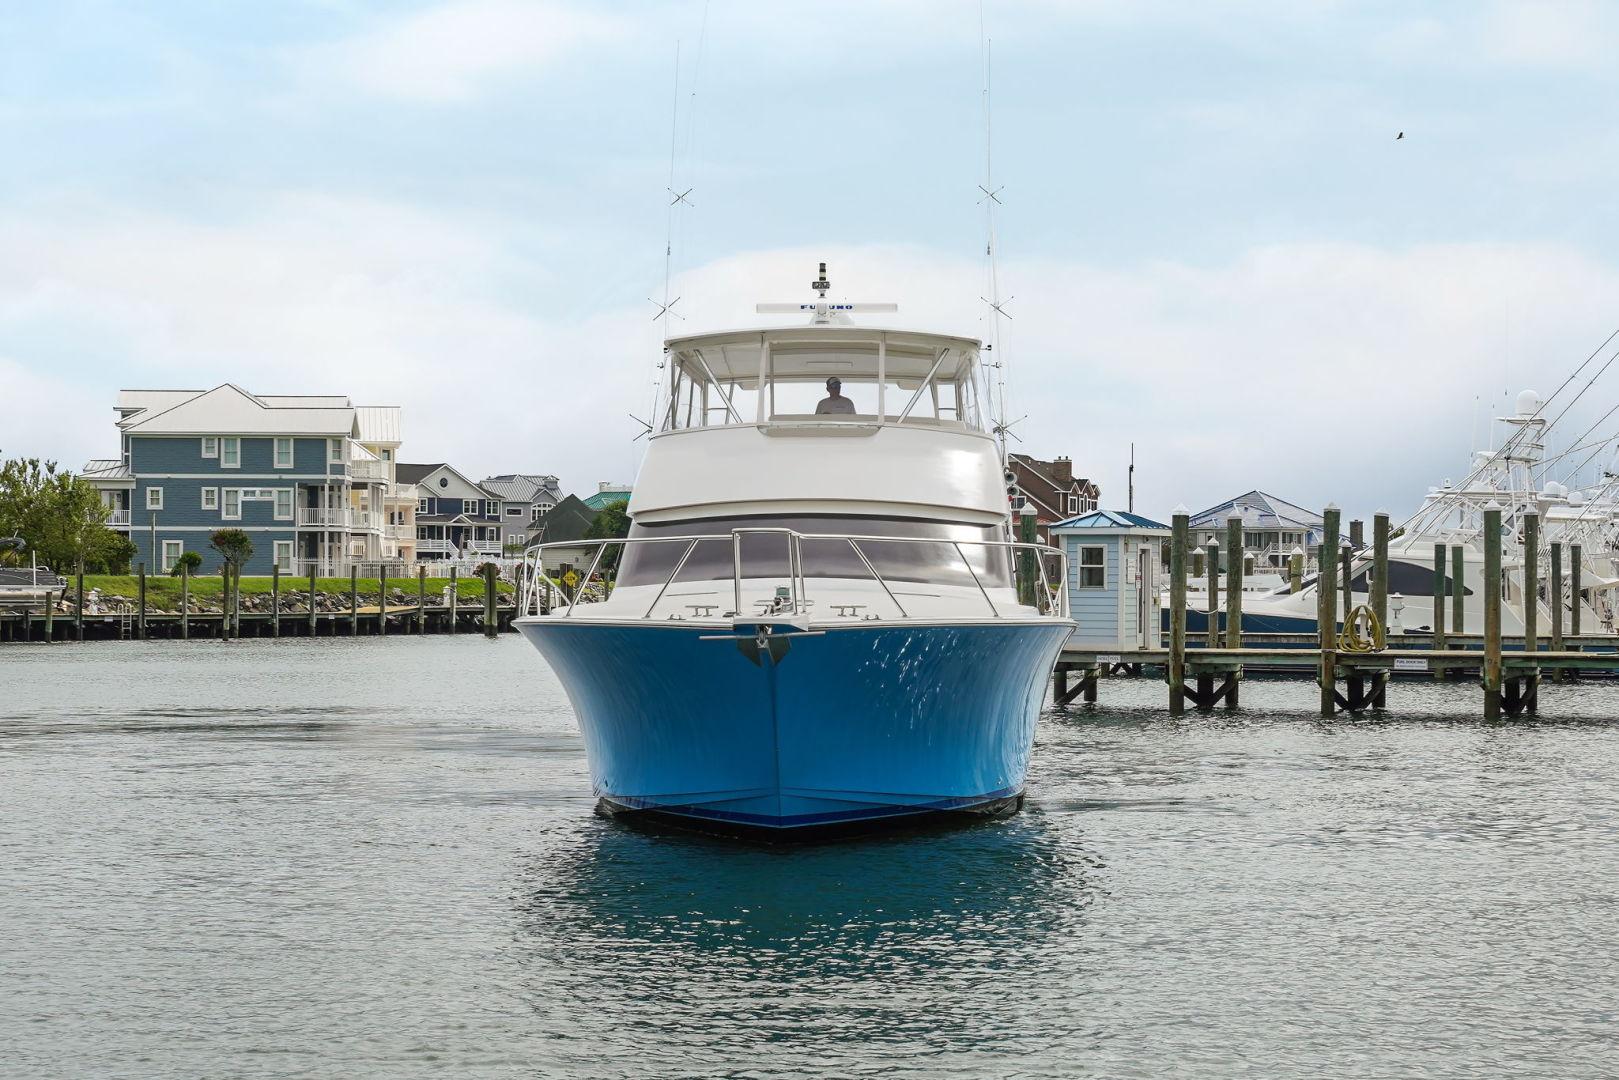 Viking-Convertible 2002-Blue Eyes North Palm Beach-Florida-United States-Blue Eyes-1490418   Thumbnail